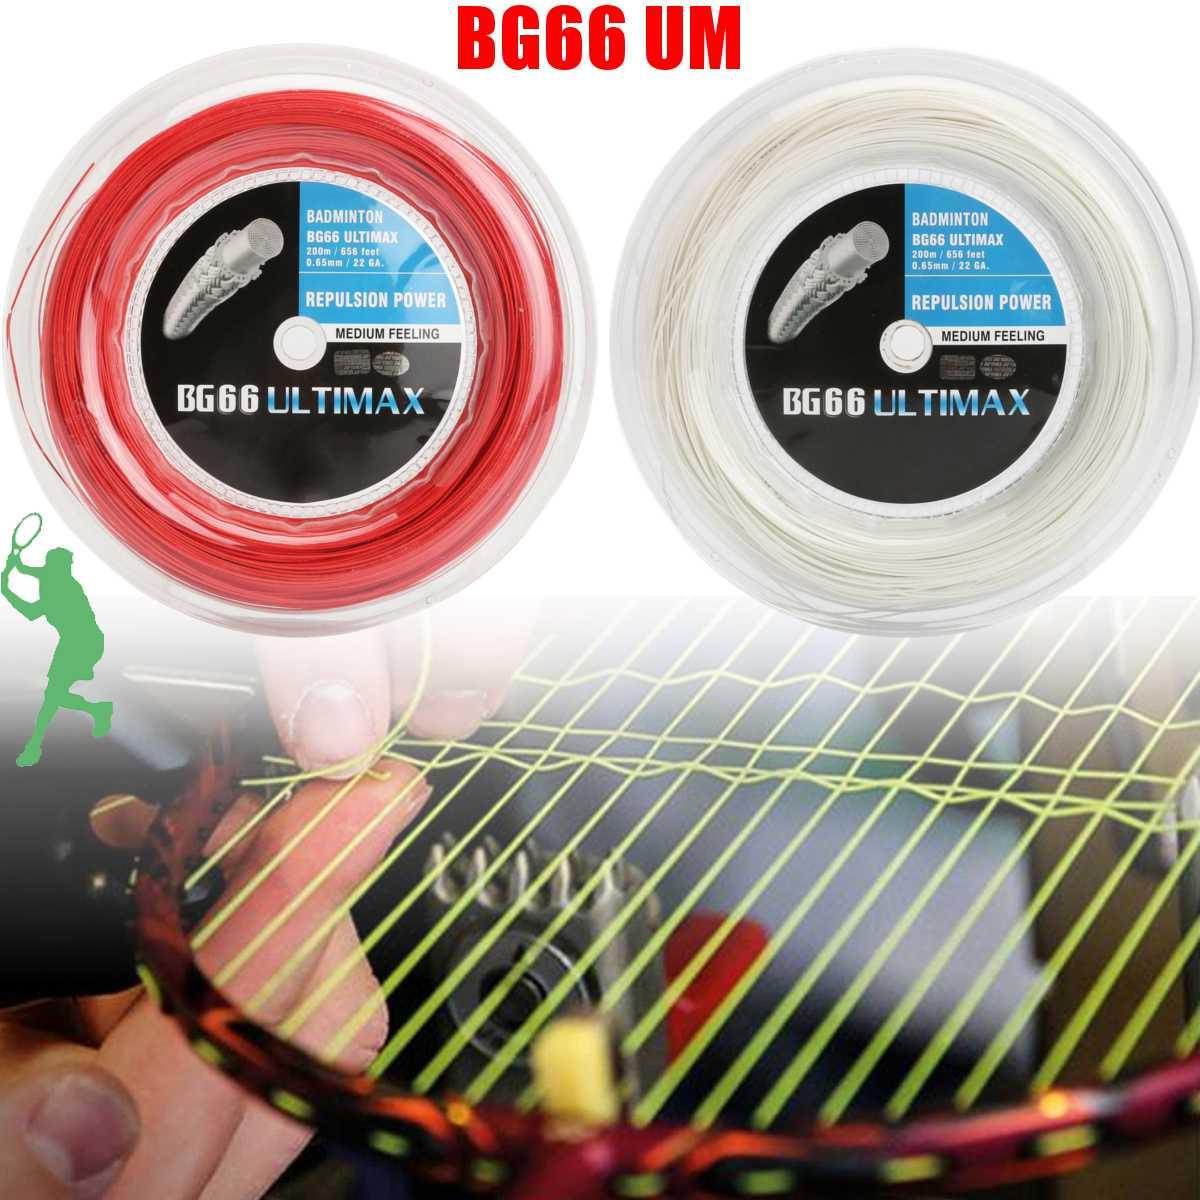 BG80 200m Durable Badminton Elastic Racket String Coil High Polymer Reel White/Red String